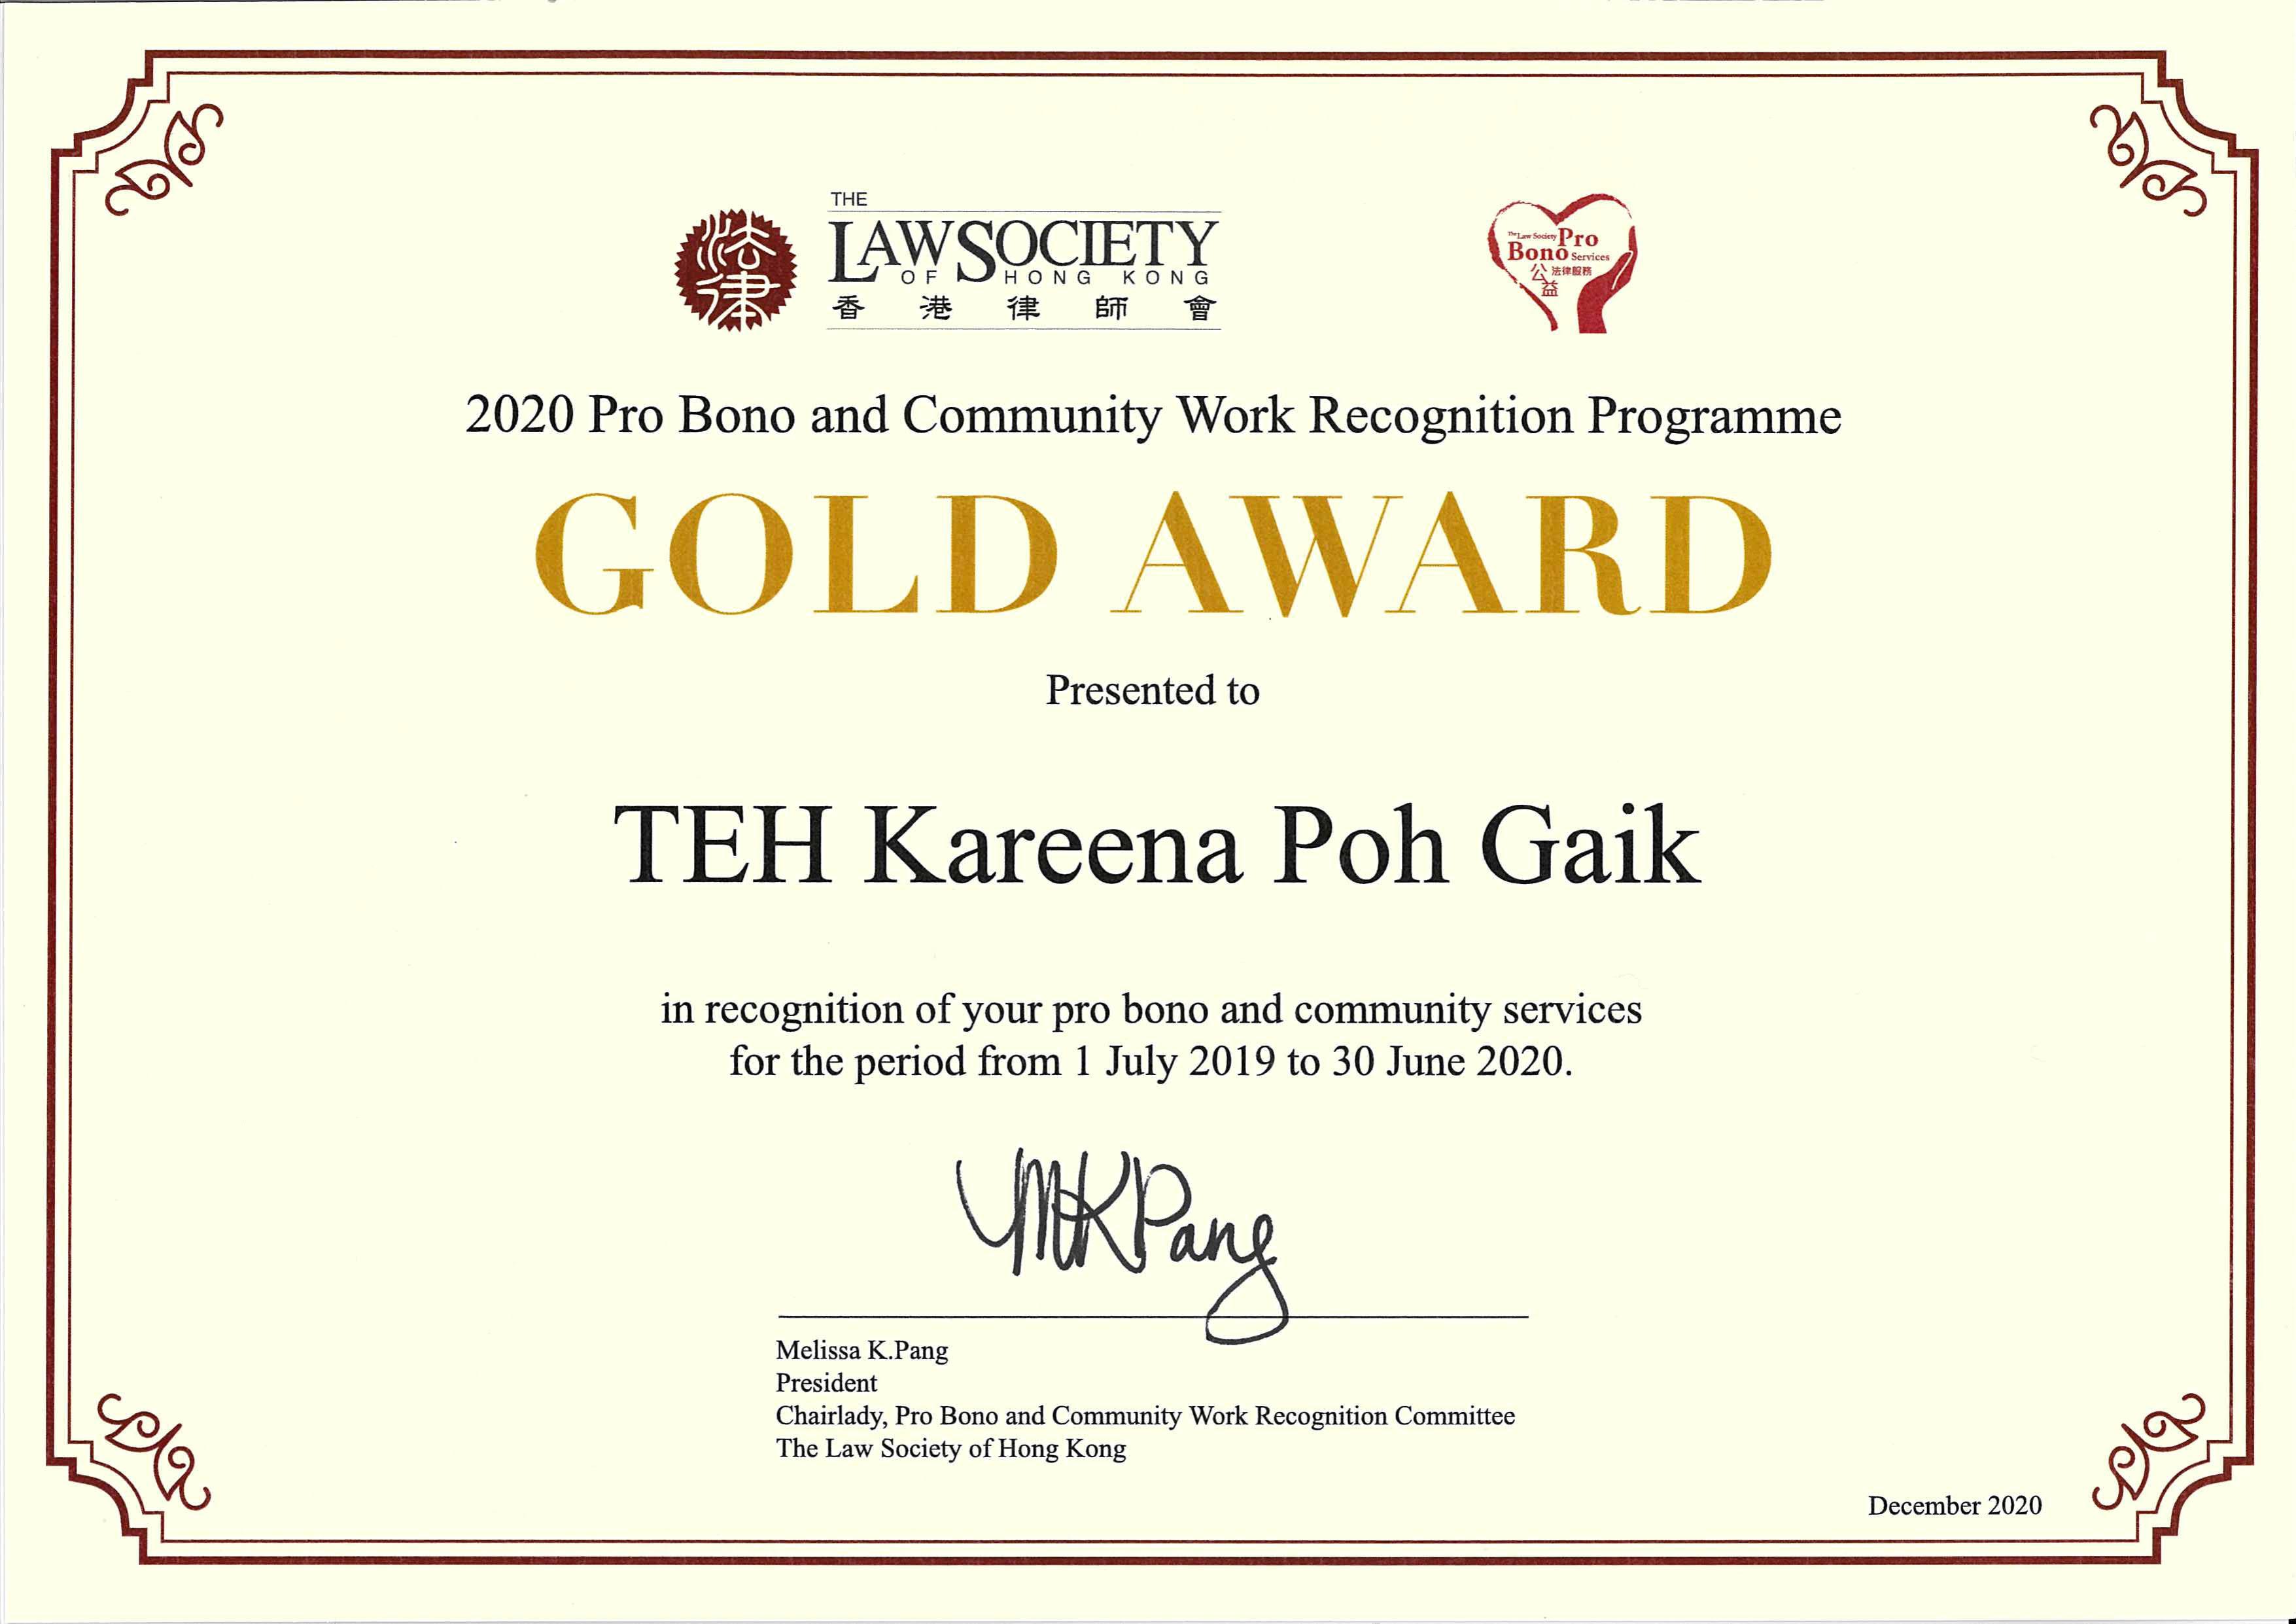 Individual Gold Award in Pro Bono and Community Services by The Law Society of Hong Kong, LC Lawyers LLP, Kareena Teh, 2020